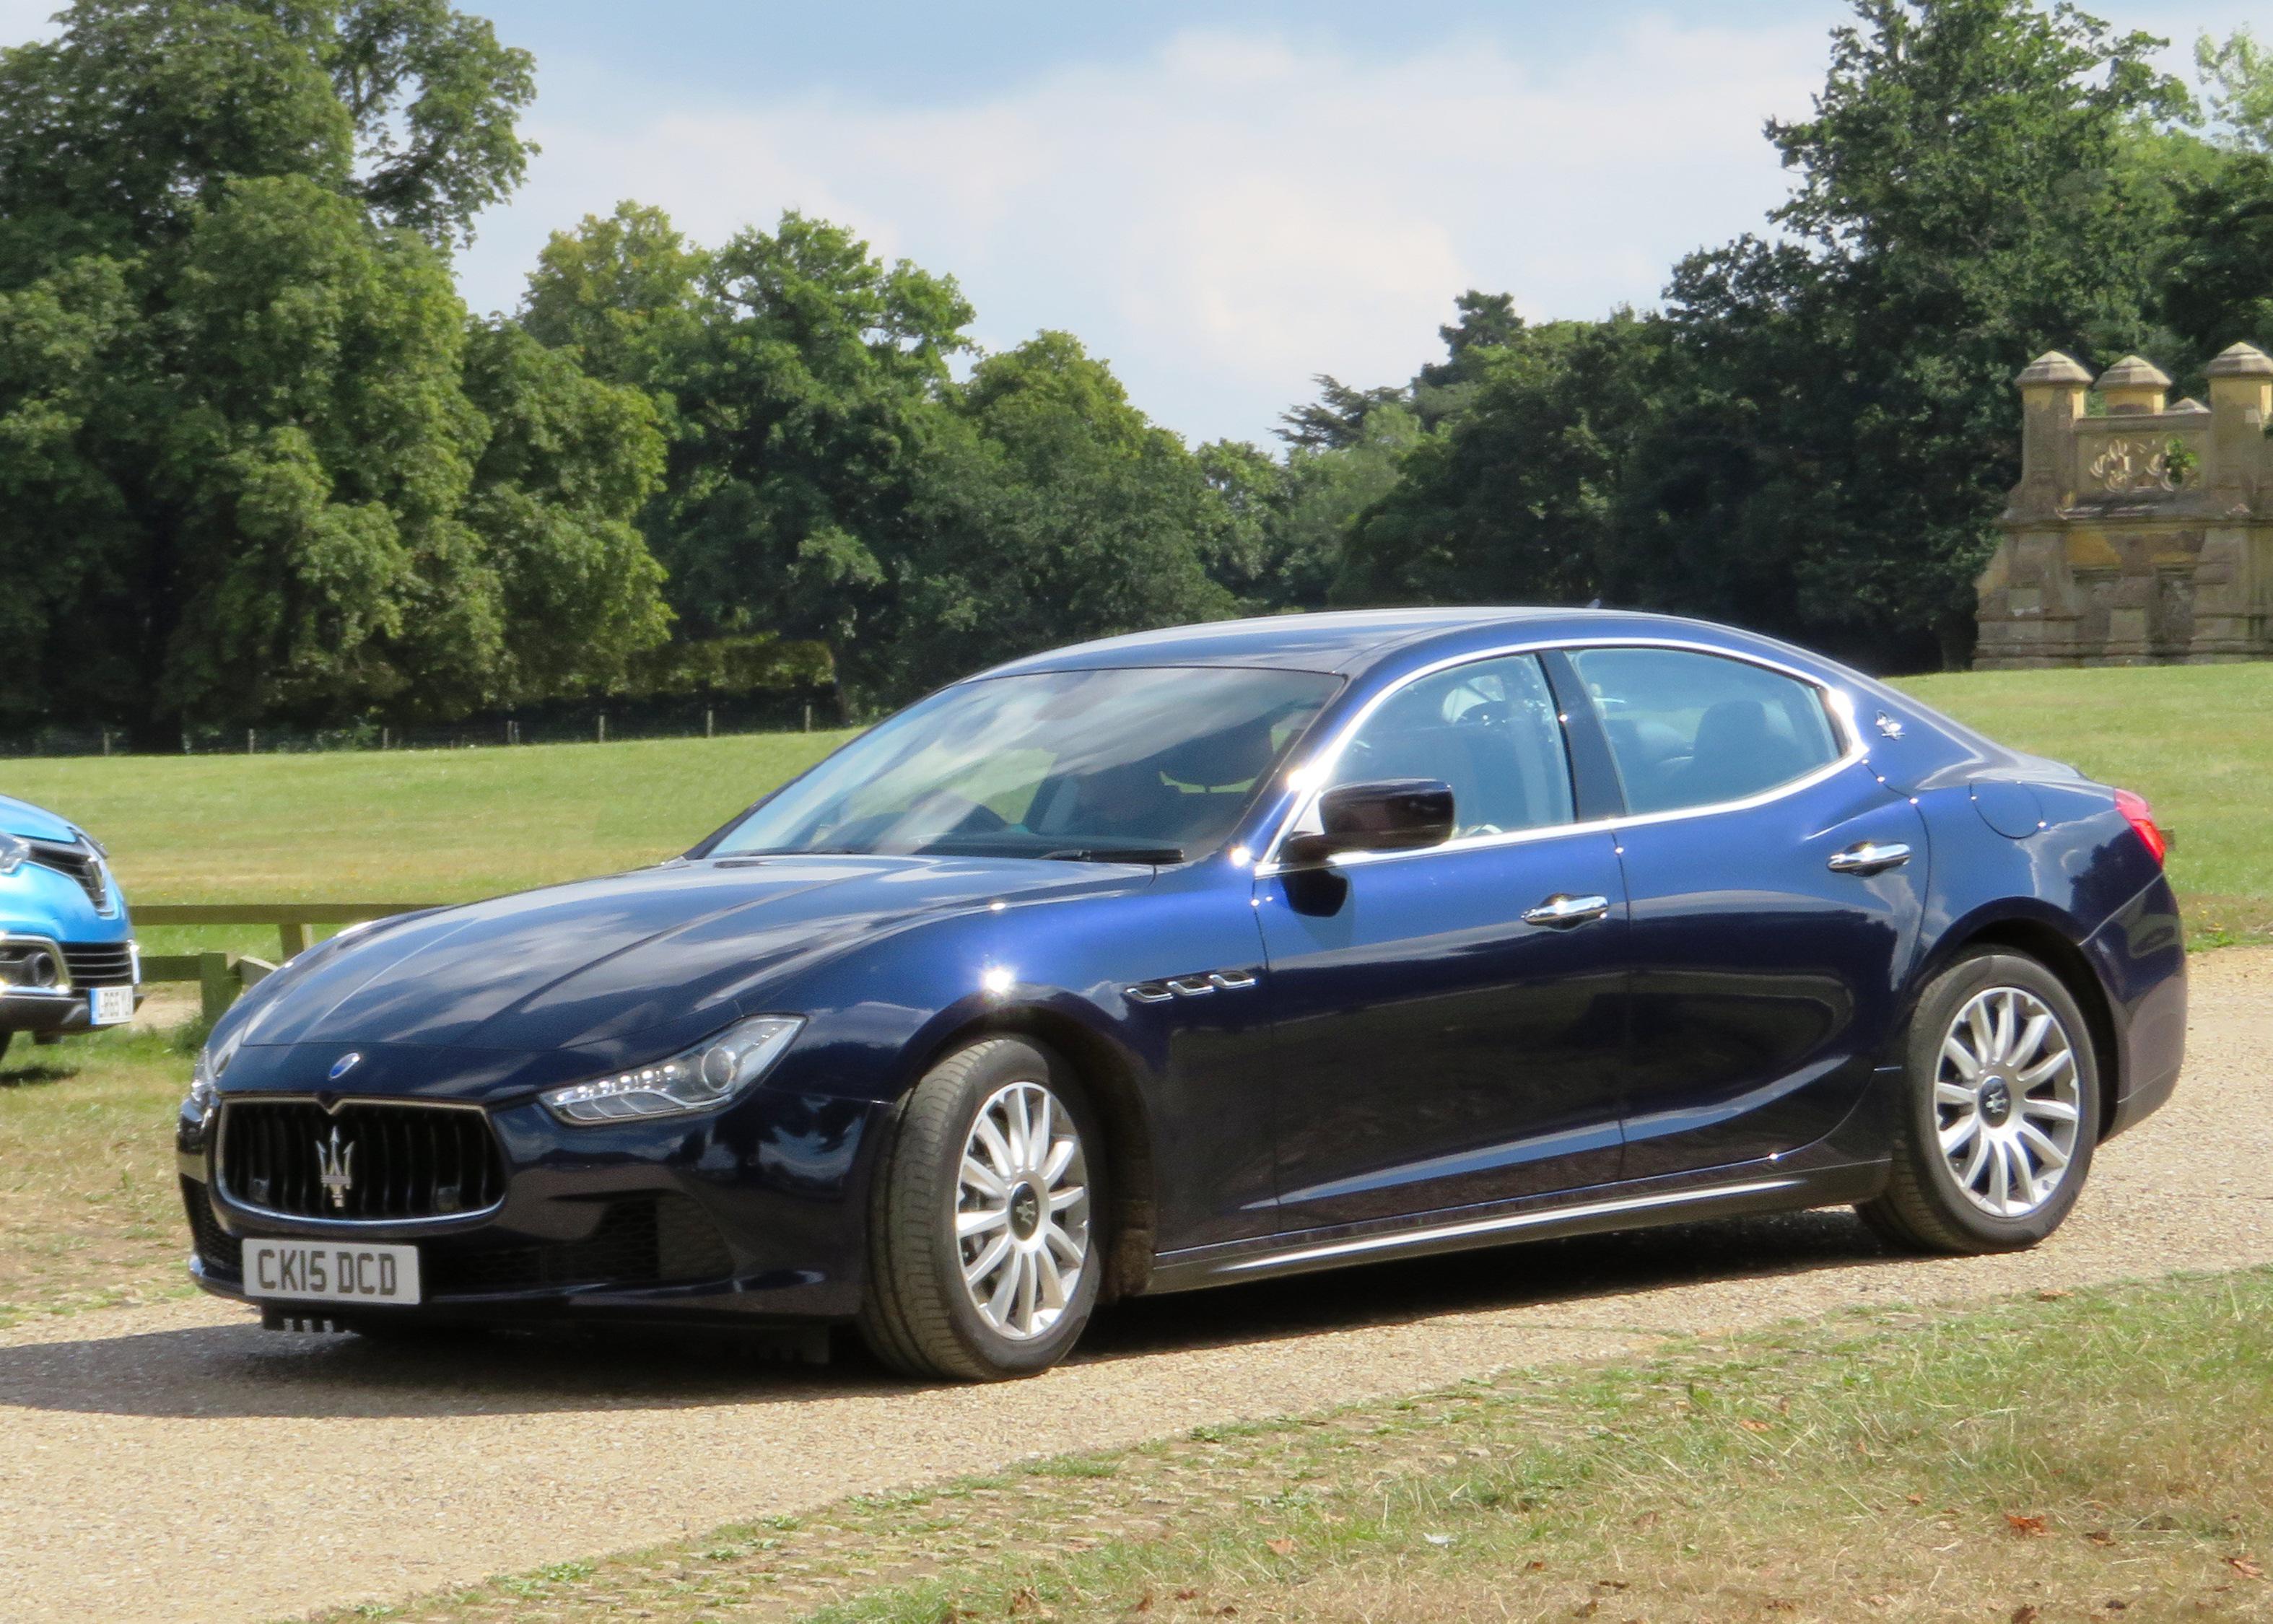 File:2015 Maserati Ghibli III, 2987cc, registered March ...